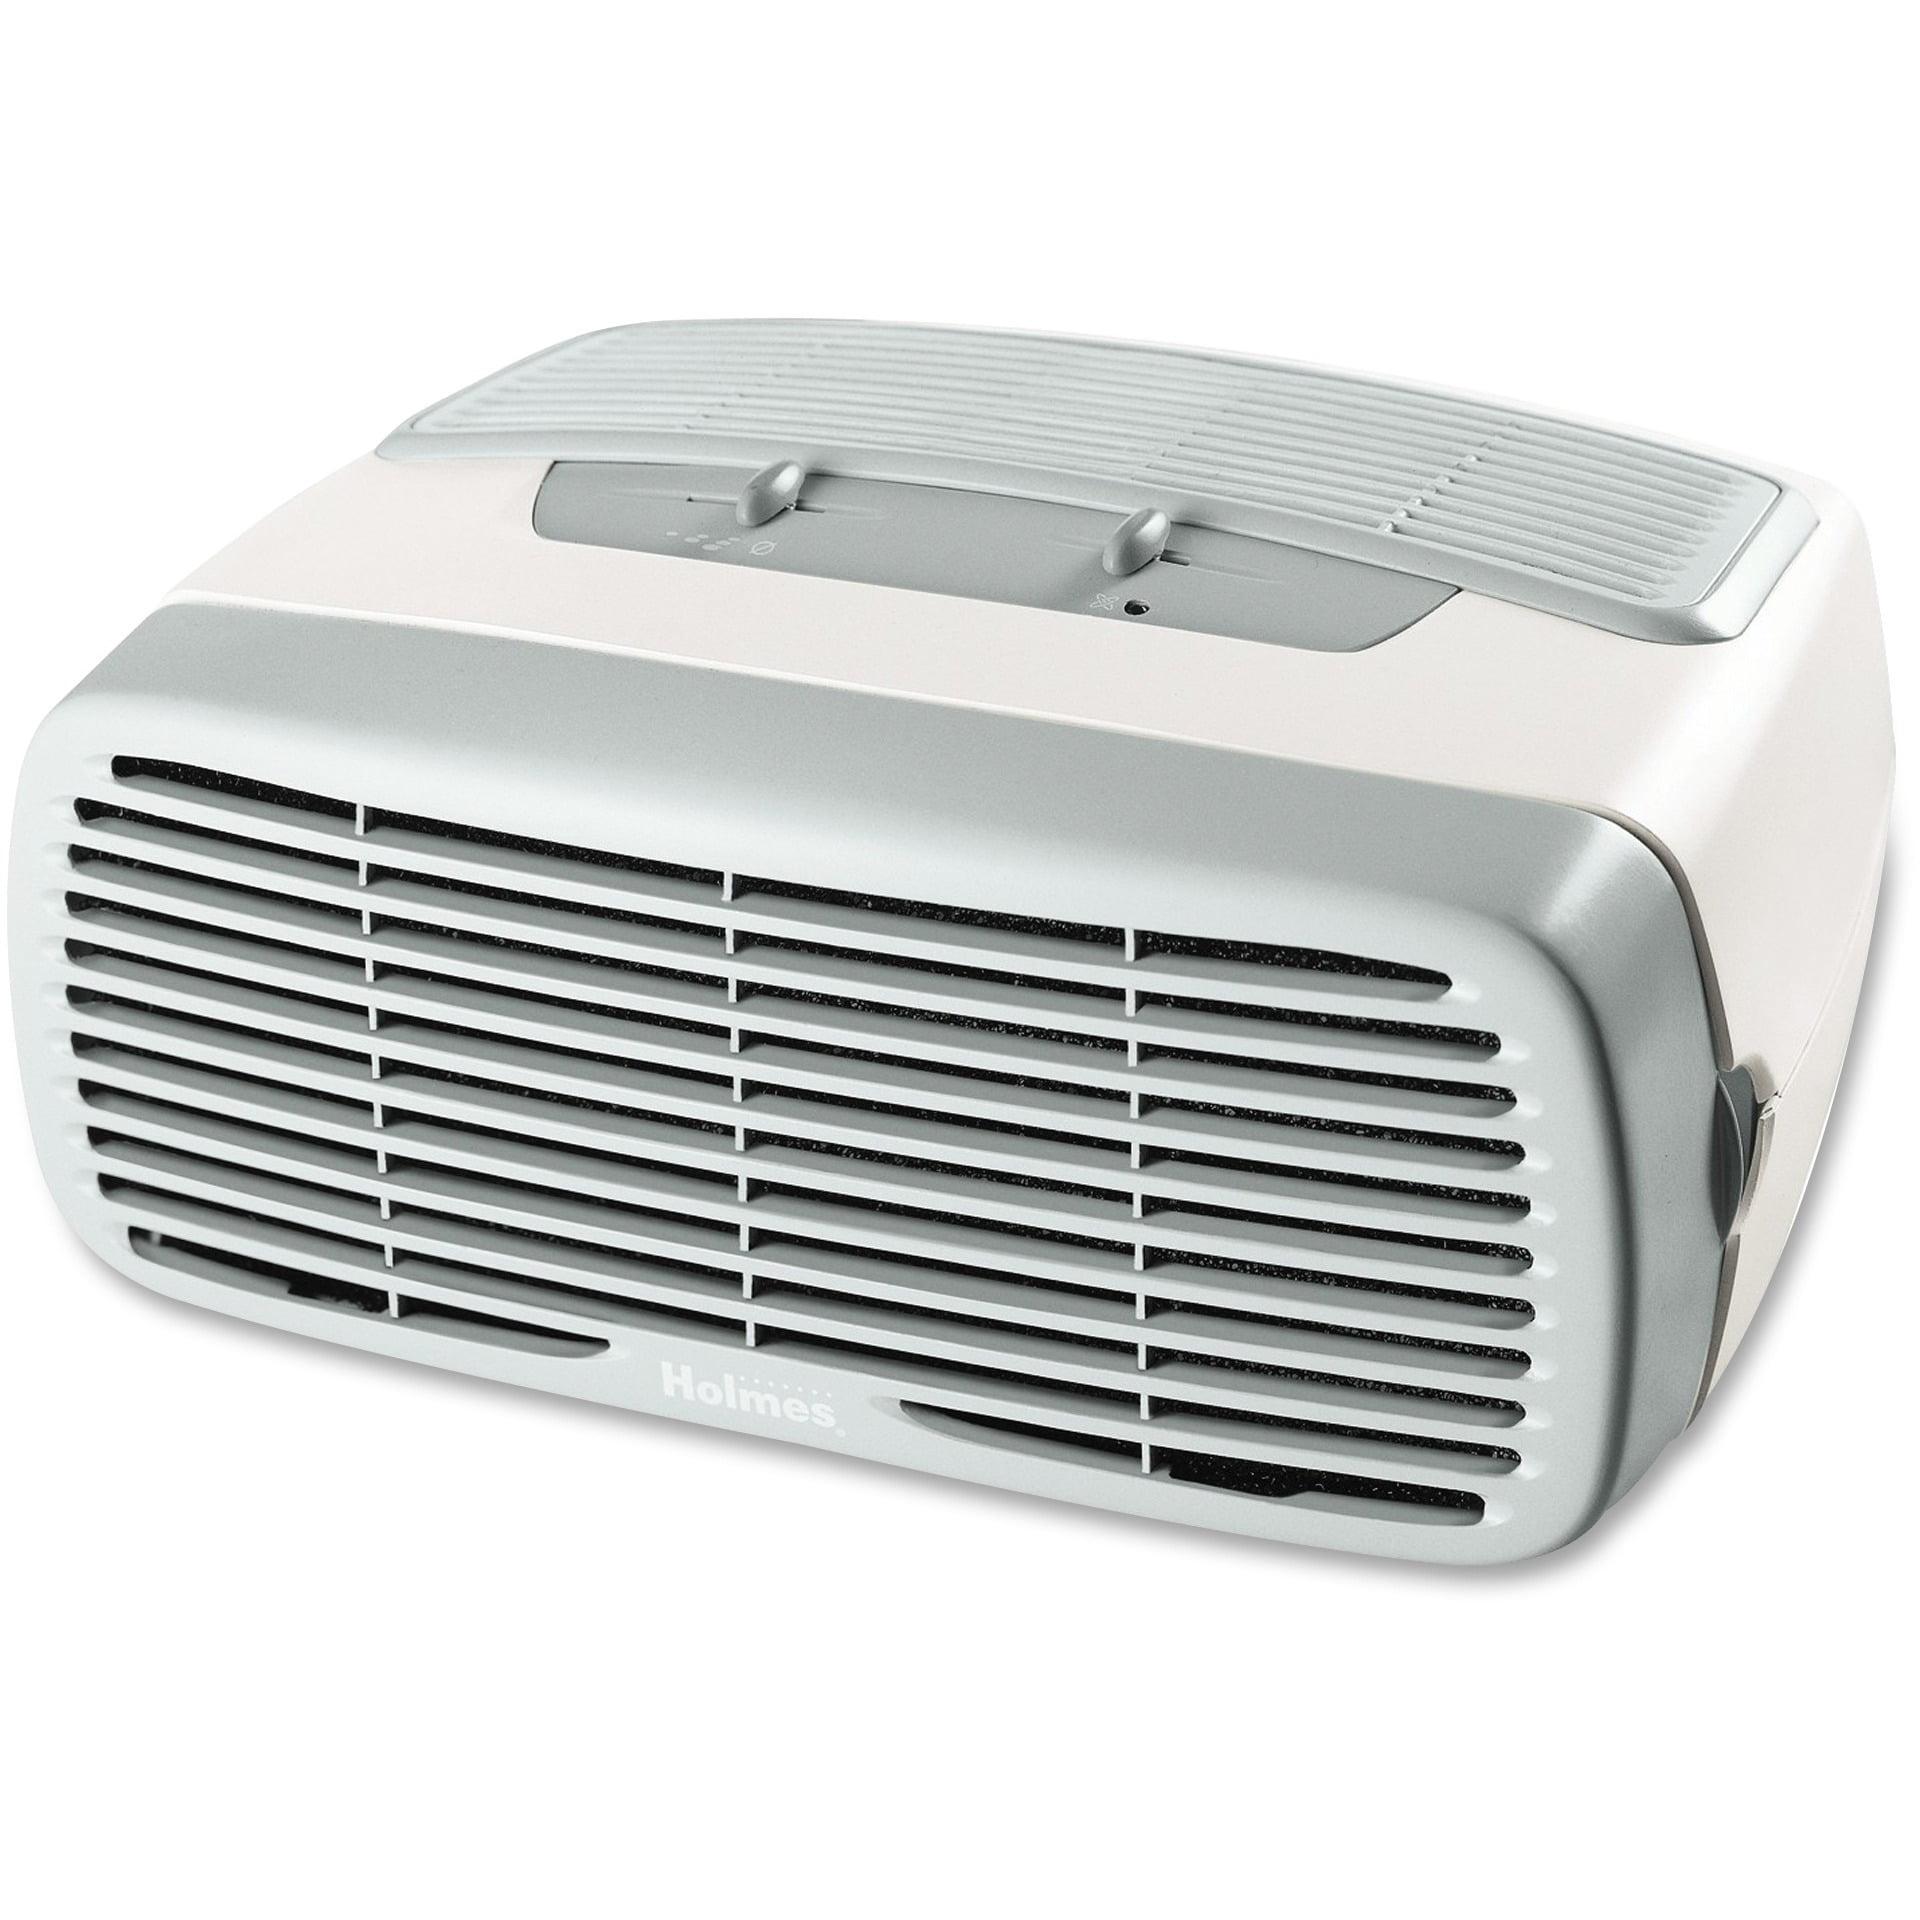 Holmes High-Efficiency HEPA-Type Desktop Air Purifier, Carbon Filter, 110 Square Foot Room Capacity, Three Speed (HAP242-UC)